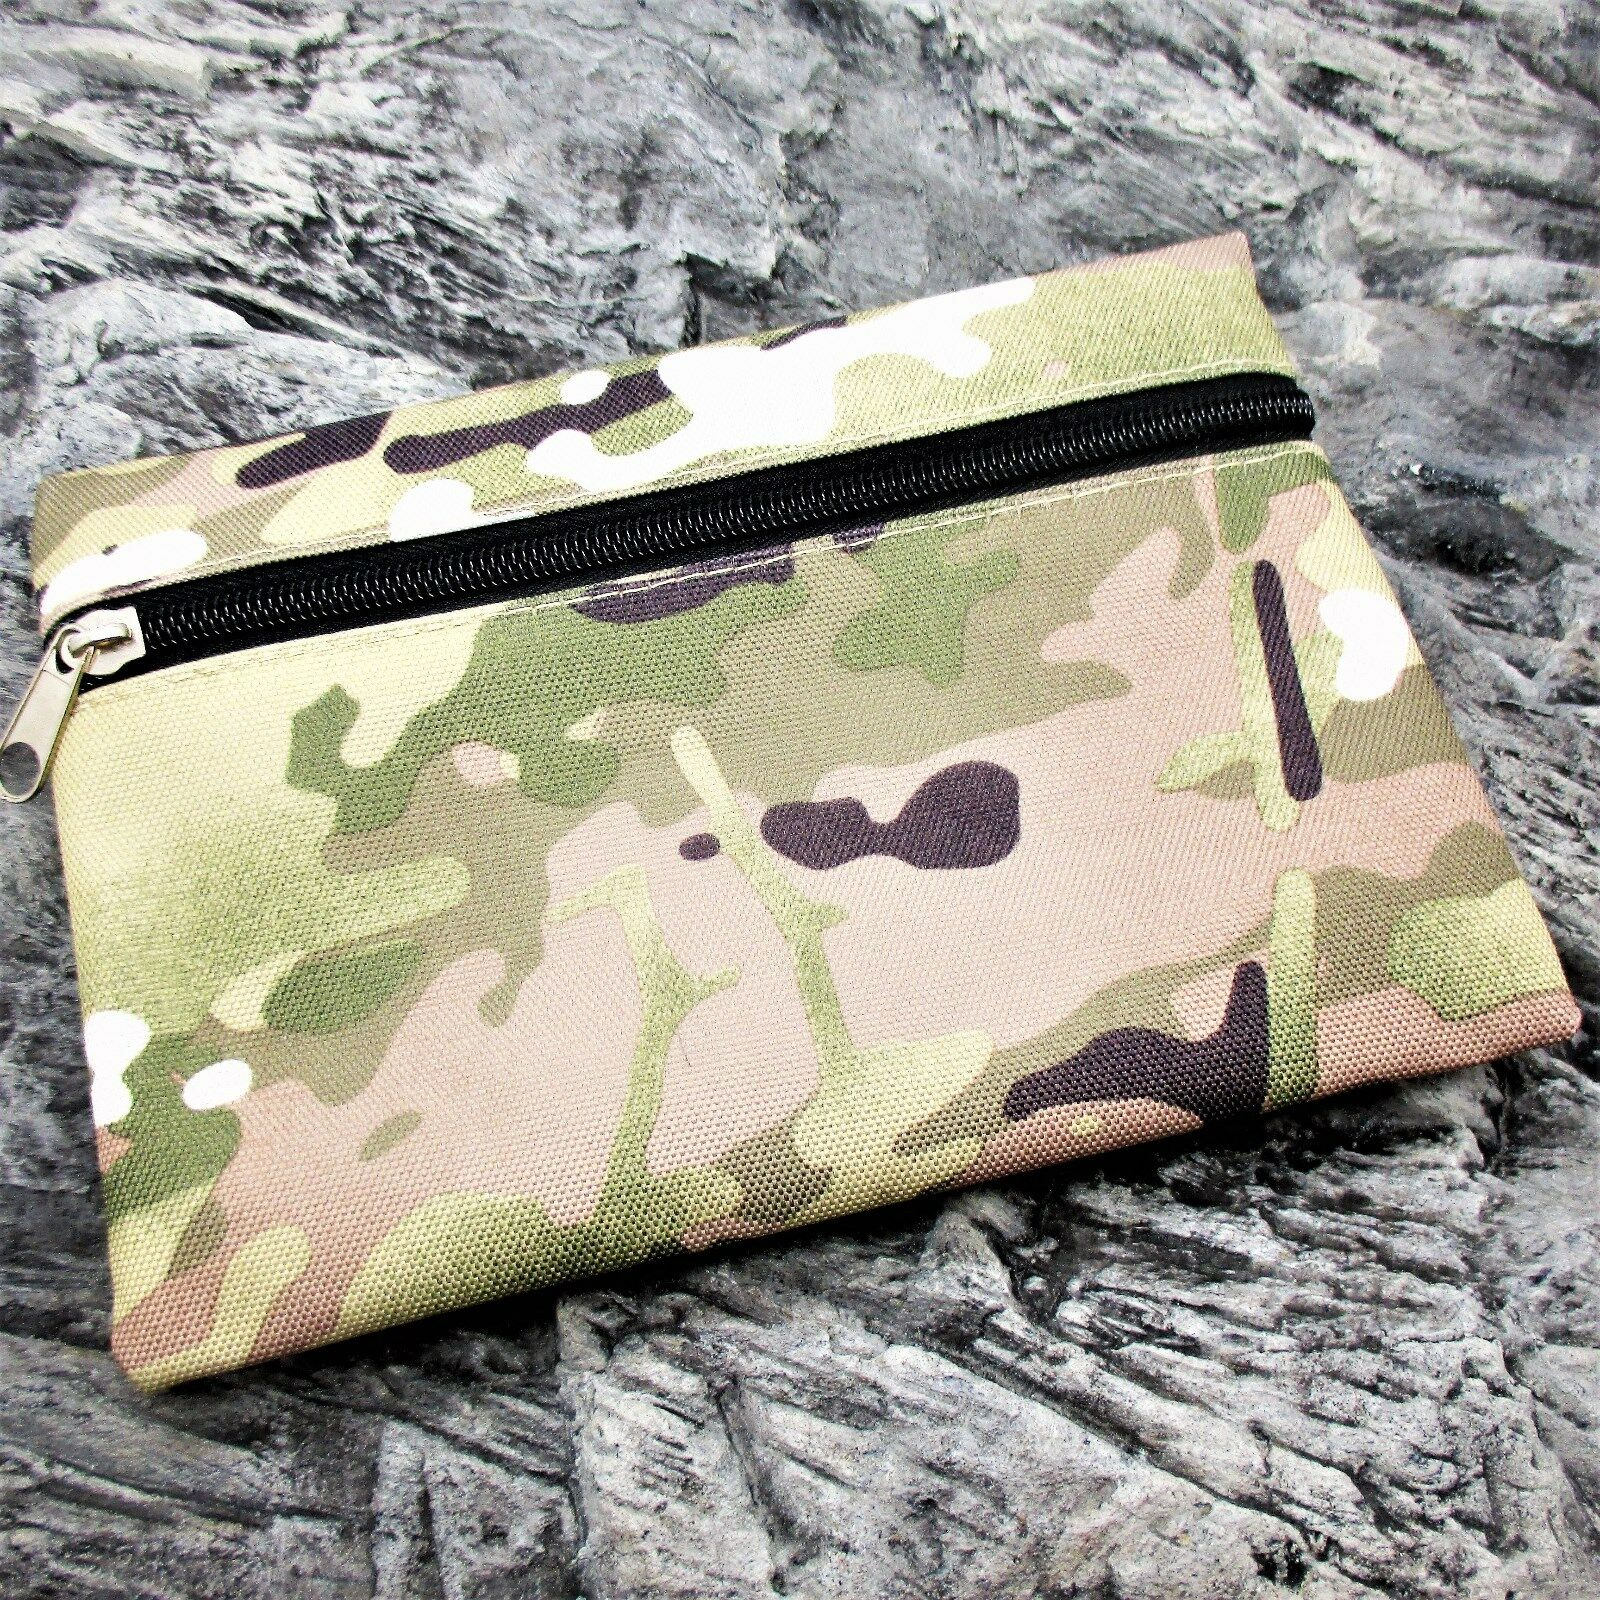 Petit camouflage stockage poche zippée camping randonnée bushcraft bushcraft bushcraft kit de survie edc f5fb75